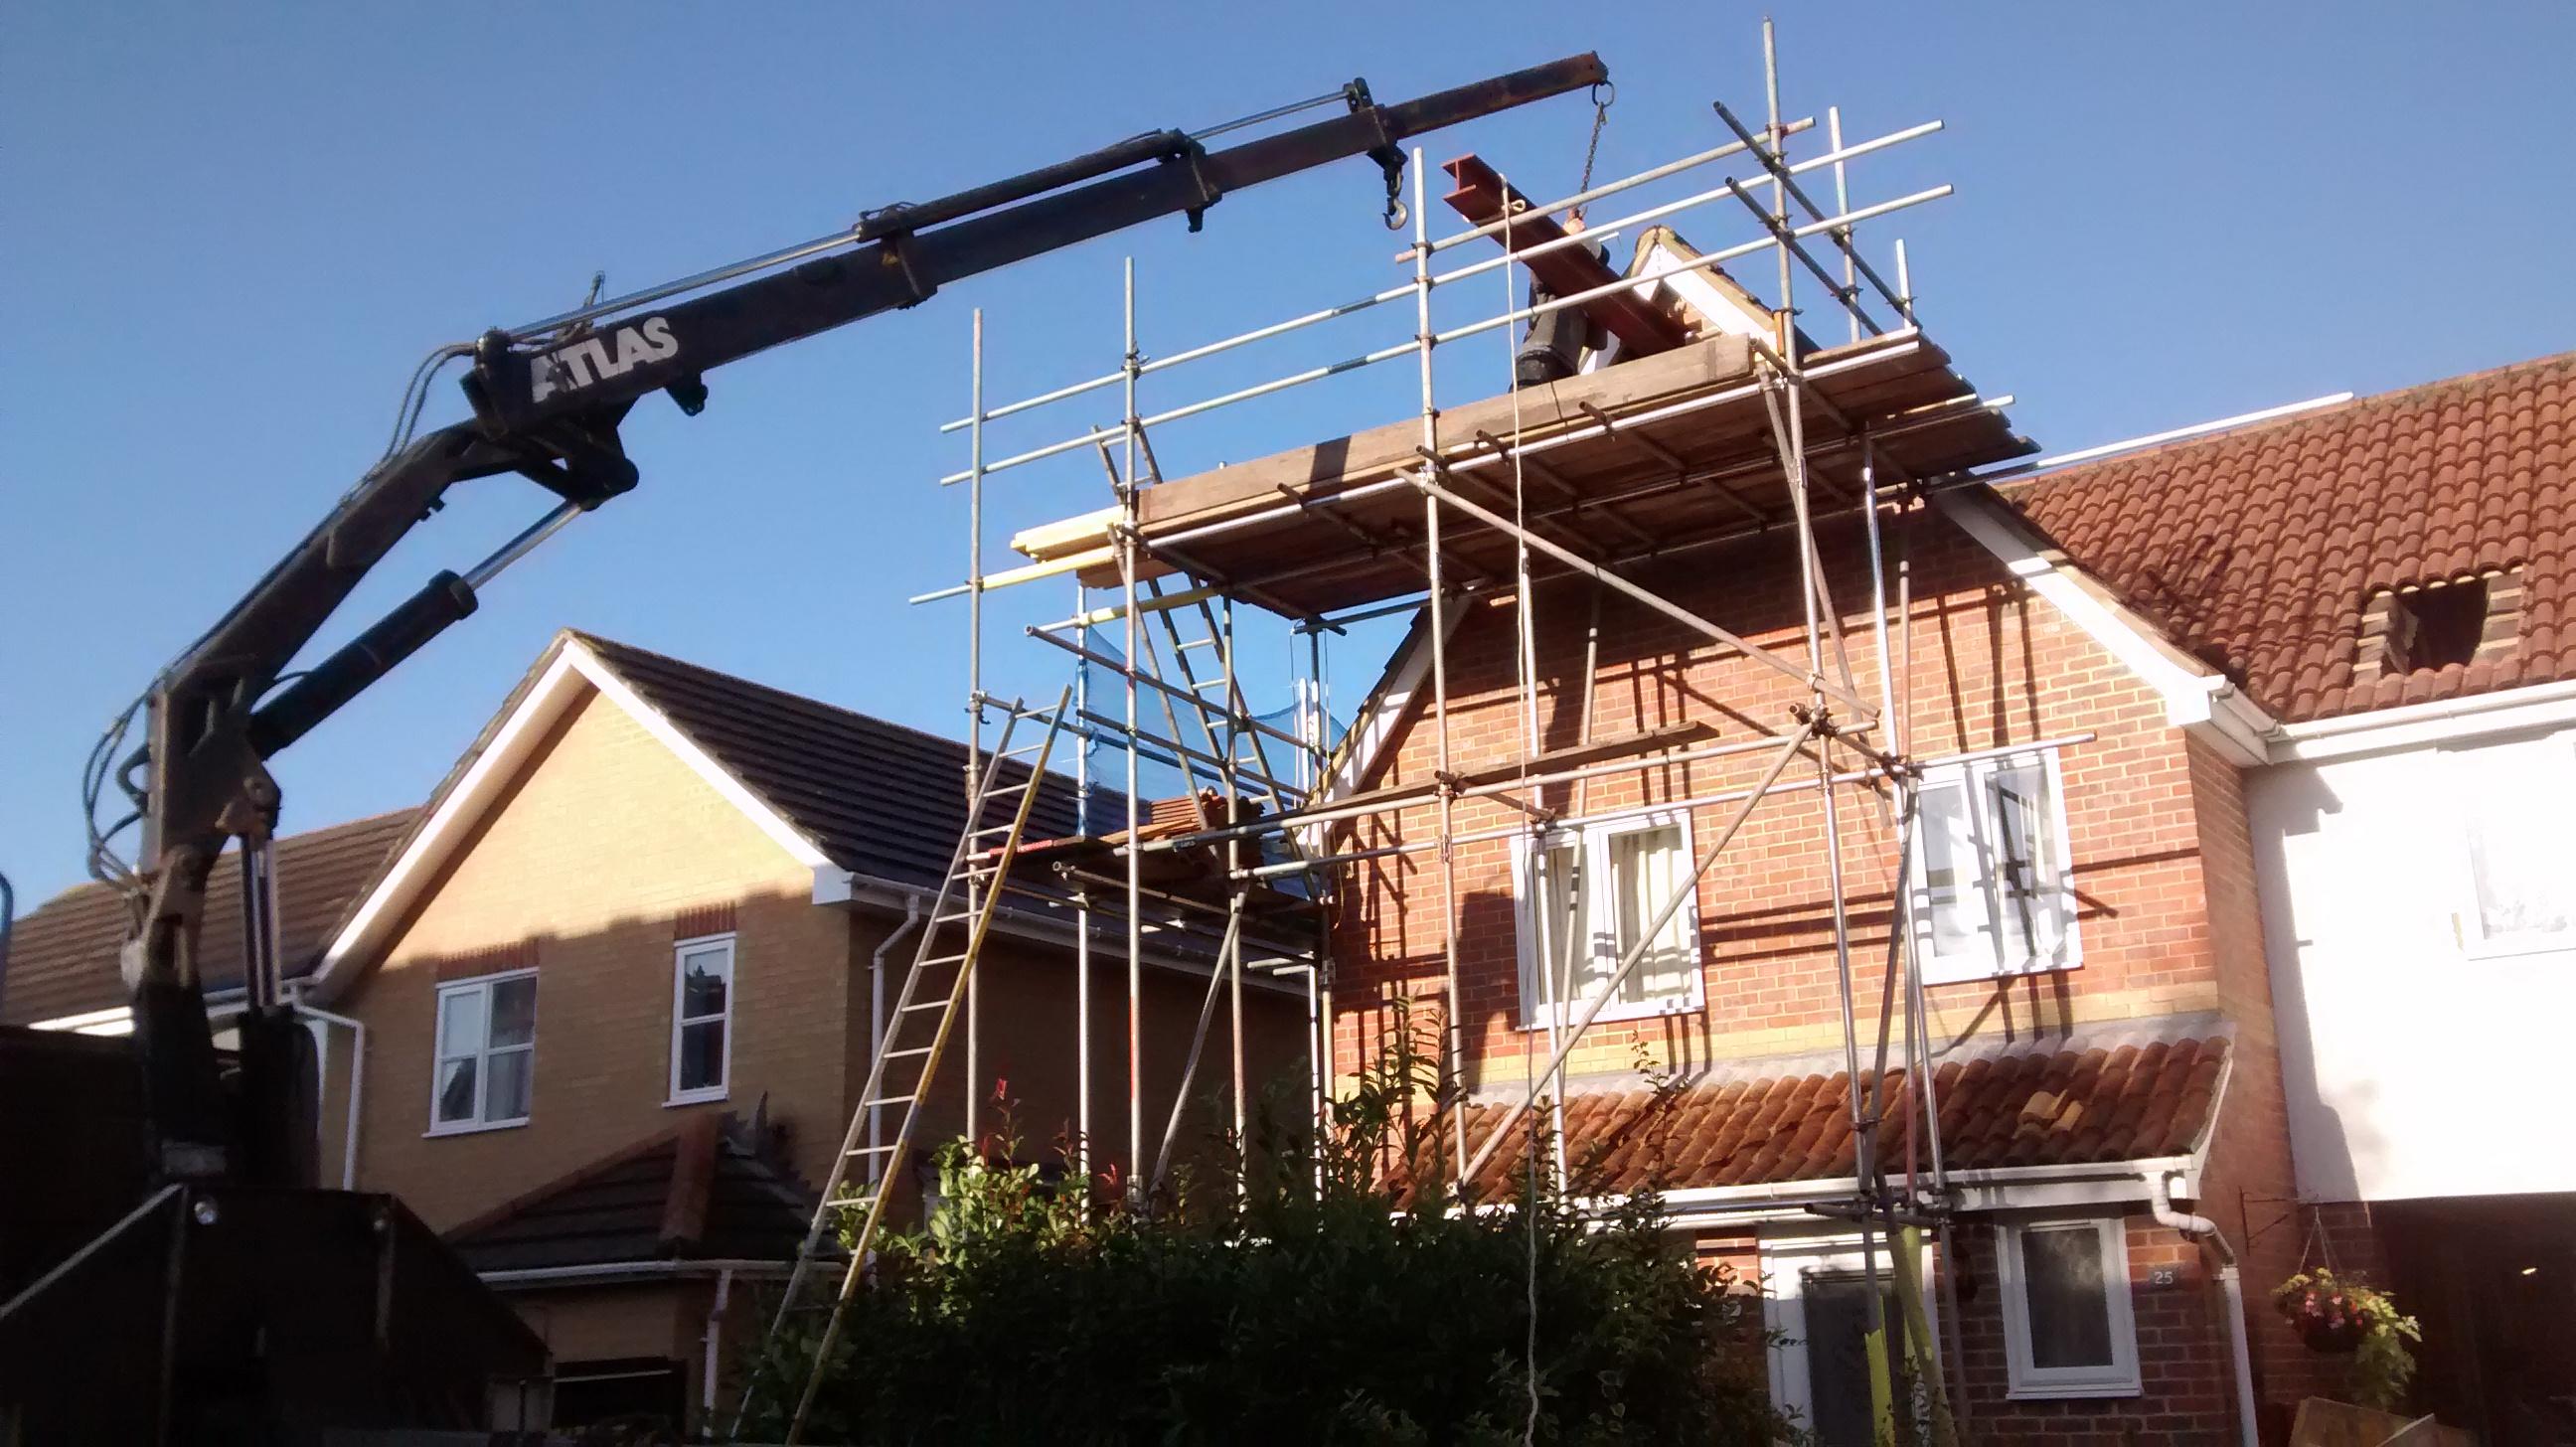 steel craned into roof